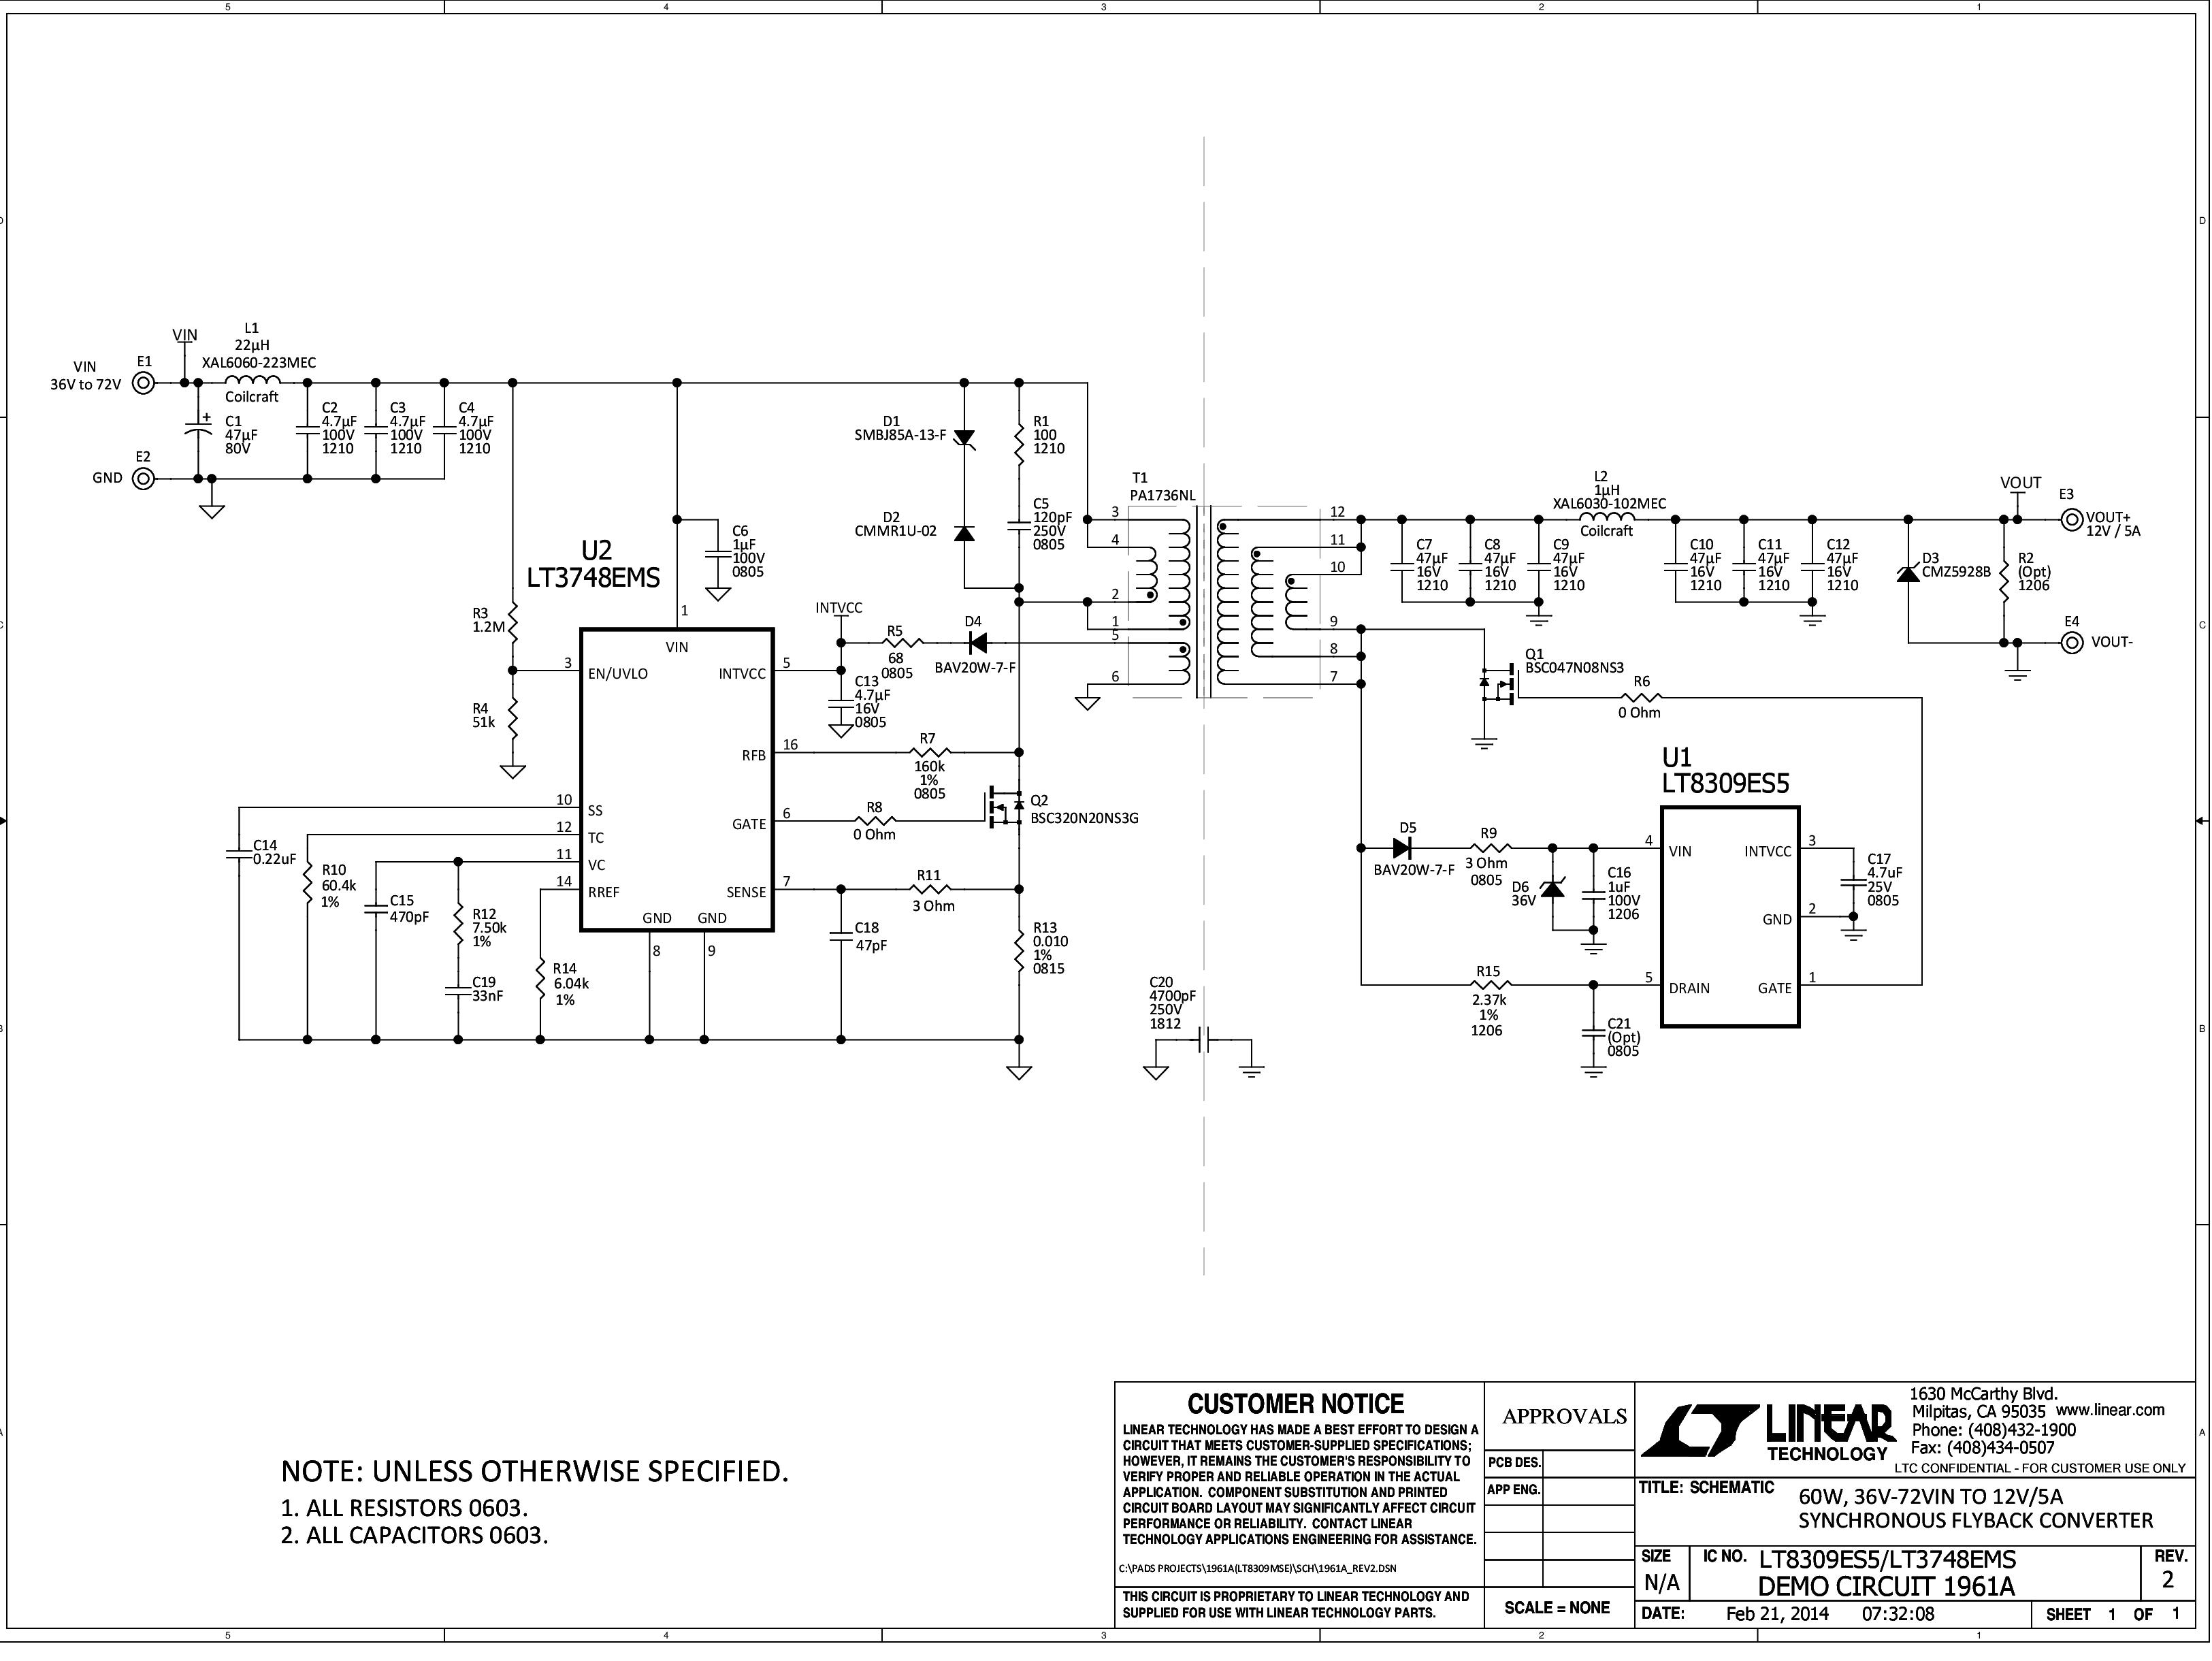 Peachy 12 Volt Switching Power Supply Using Lt3748 Basic Electronics Wiring Cloud Ittabpendurdonanfuldomelitekicepsianuembamohammedshrineorg